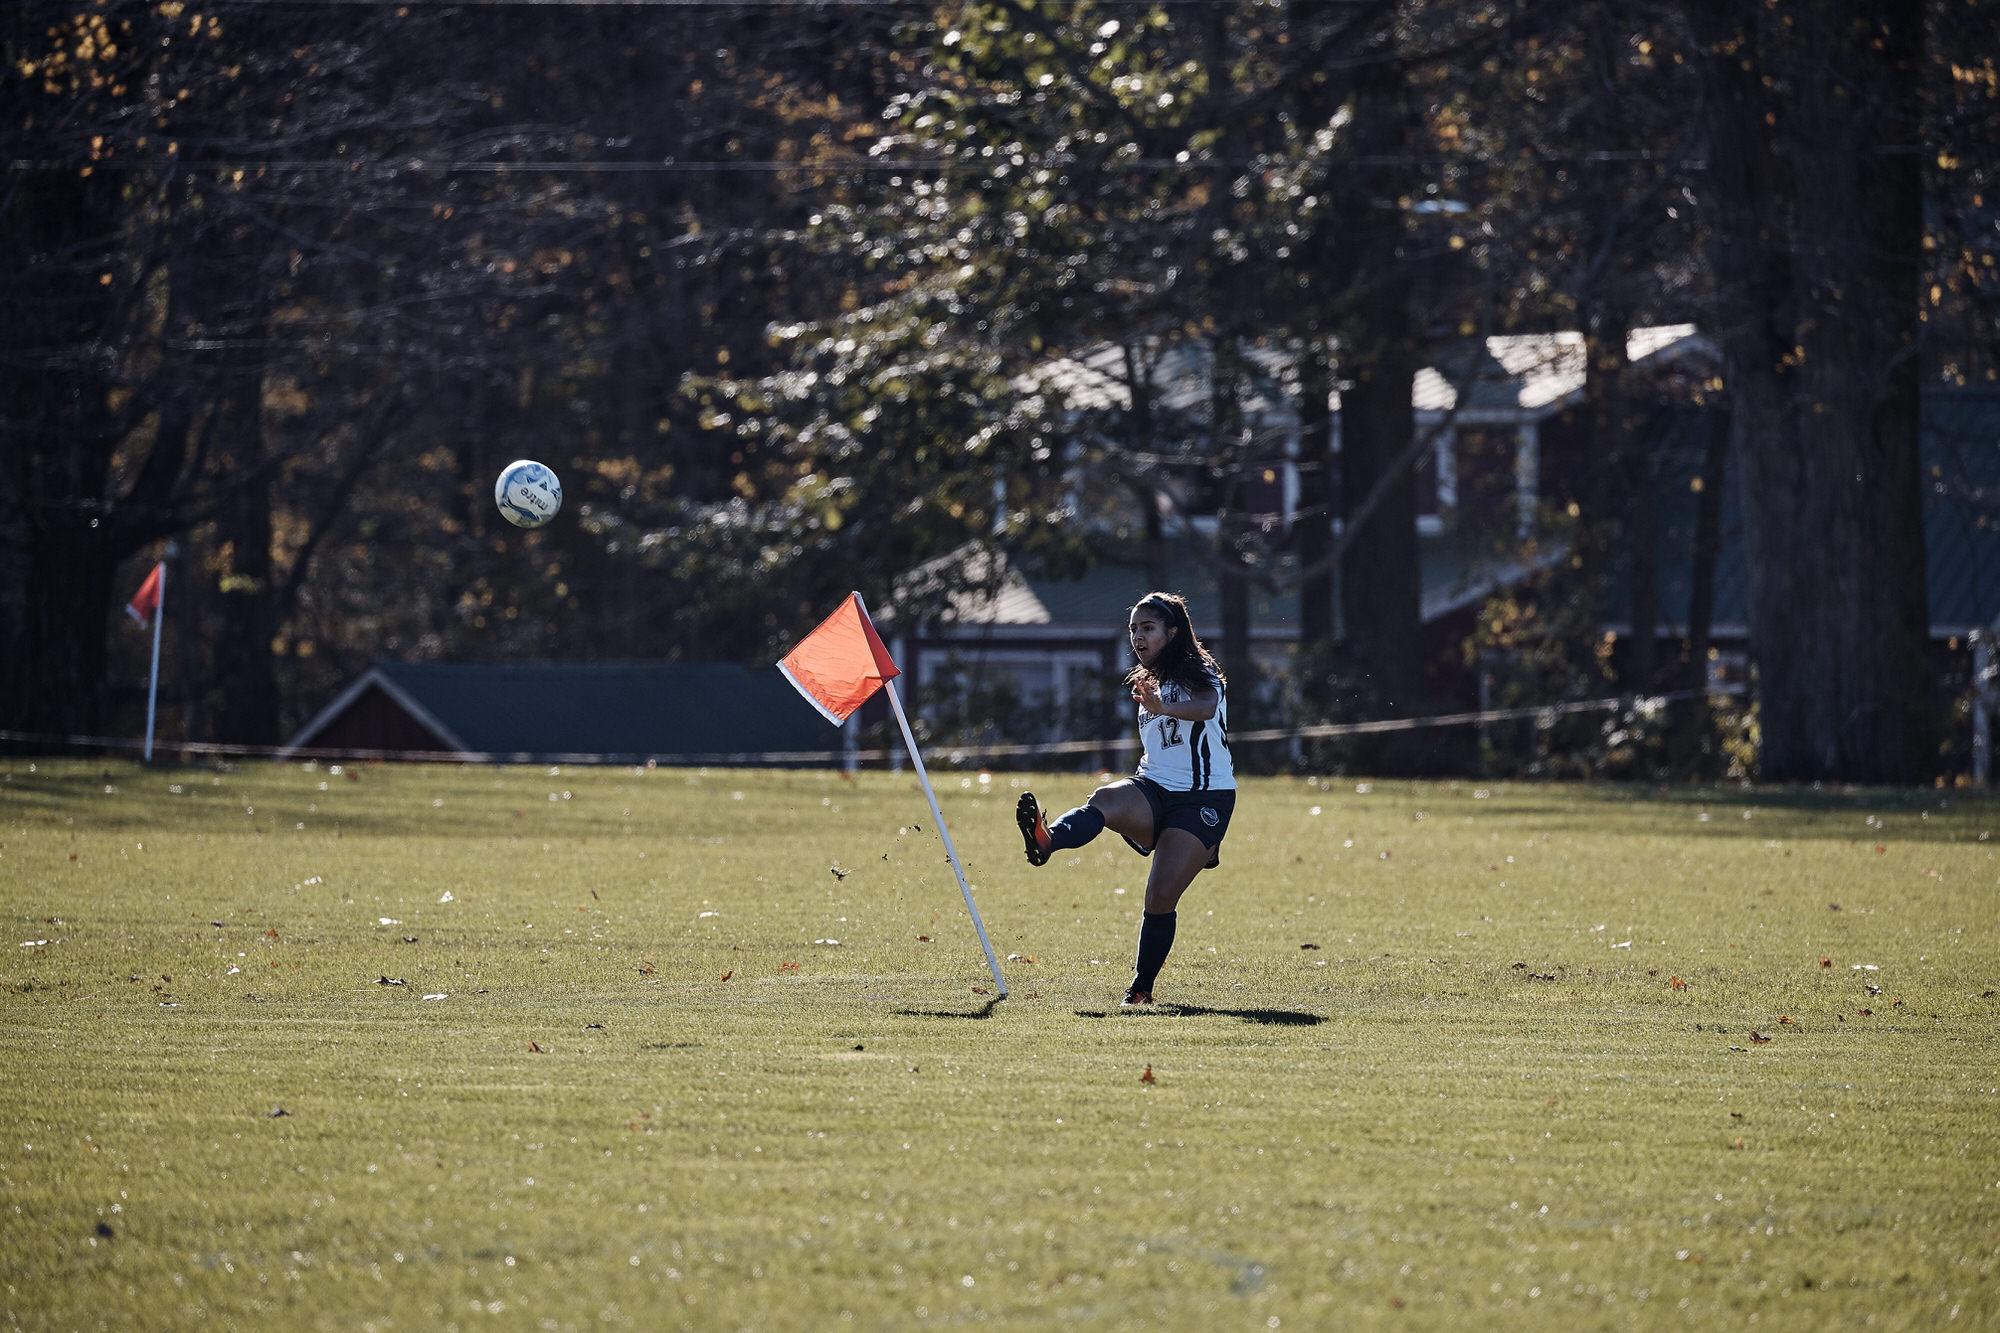 Girls Varsity Soccer vs. Putney School - October 26, 2018 - 017.jpg